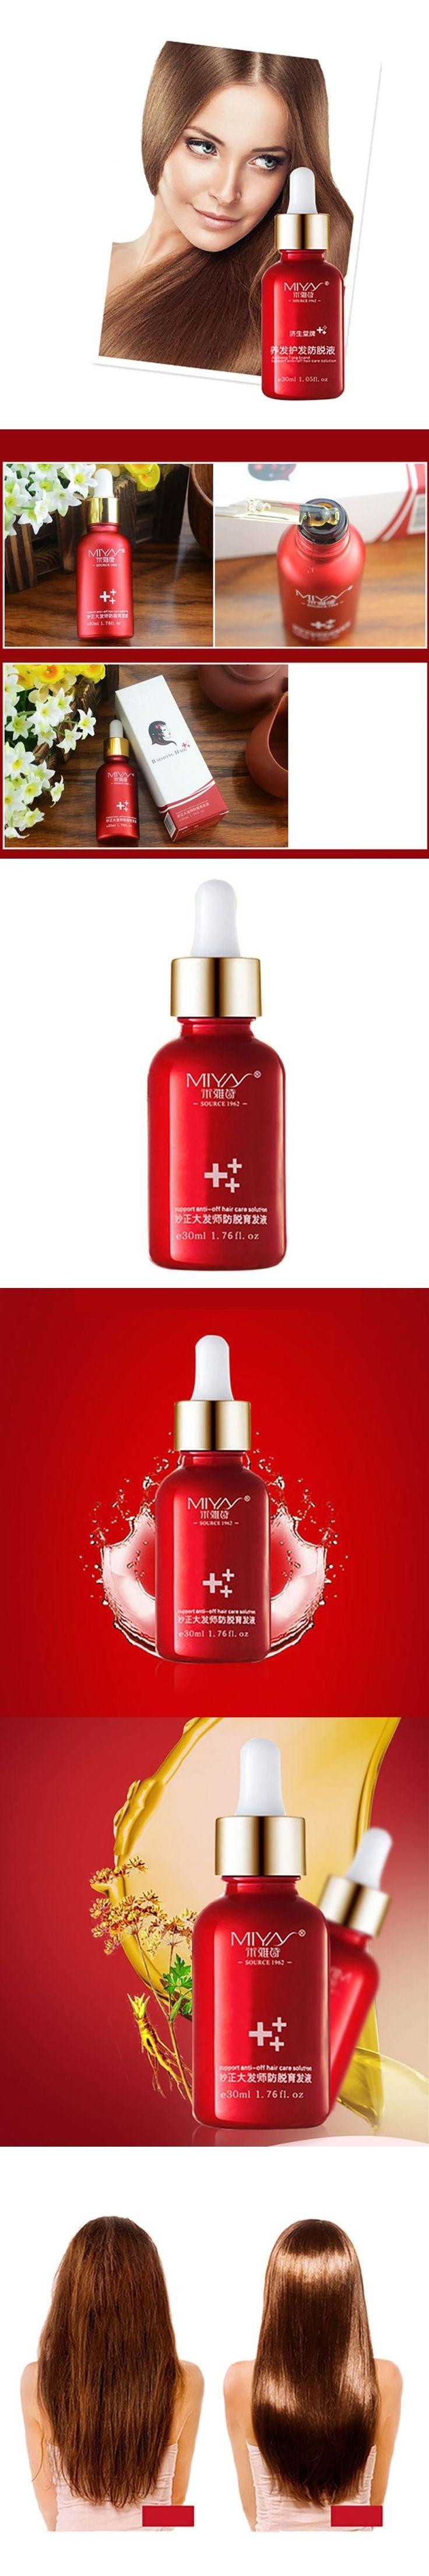 Hair Oil Hair Care Fast Powerful Hair Growth Products Regrowth Essence Liquid Treatment Preventing Hair Loss For Men And Women #HairLossTreatmentForWomen&Men